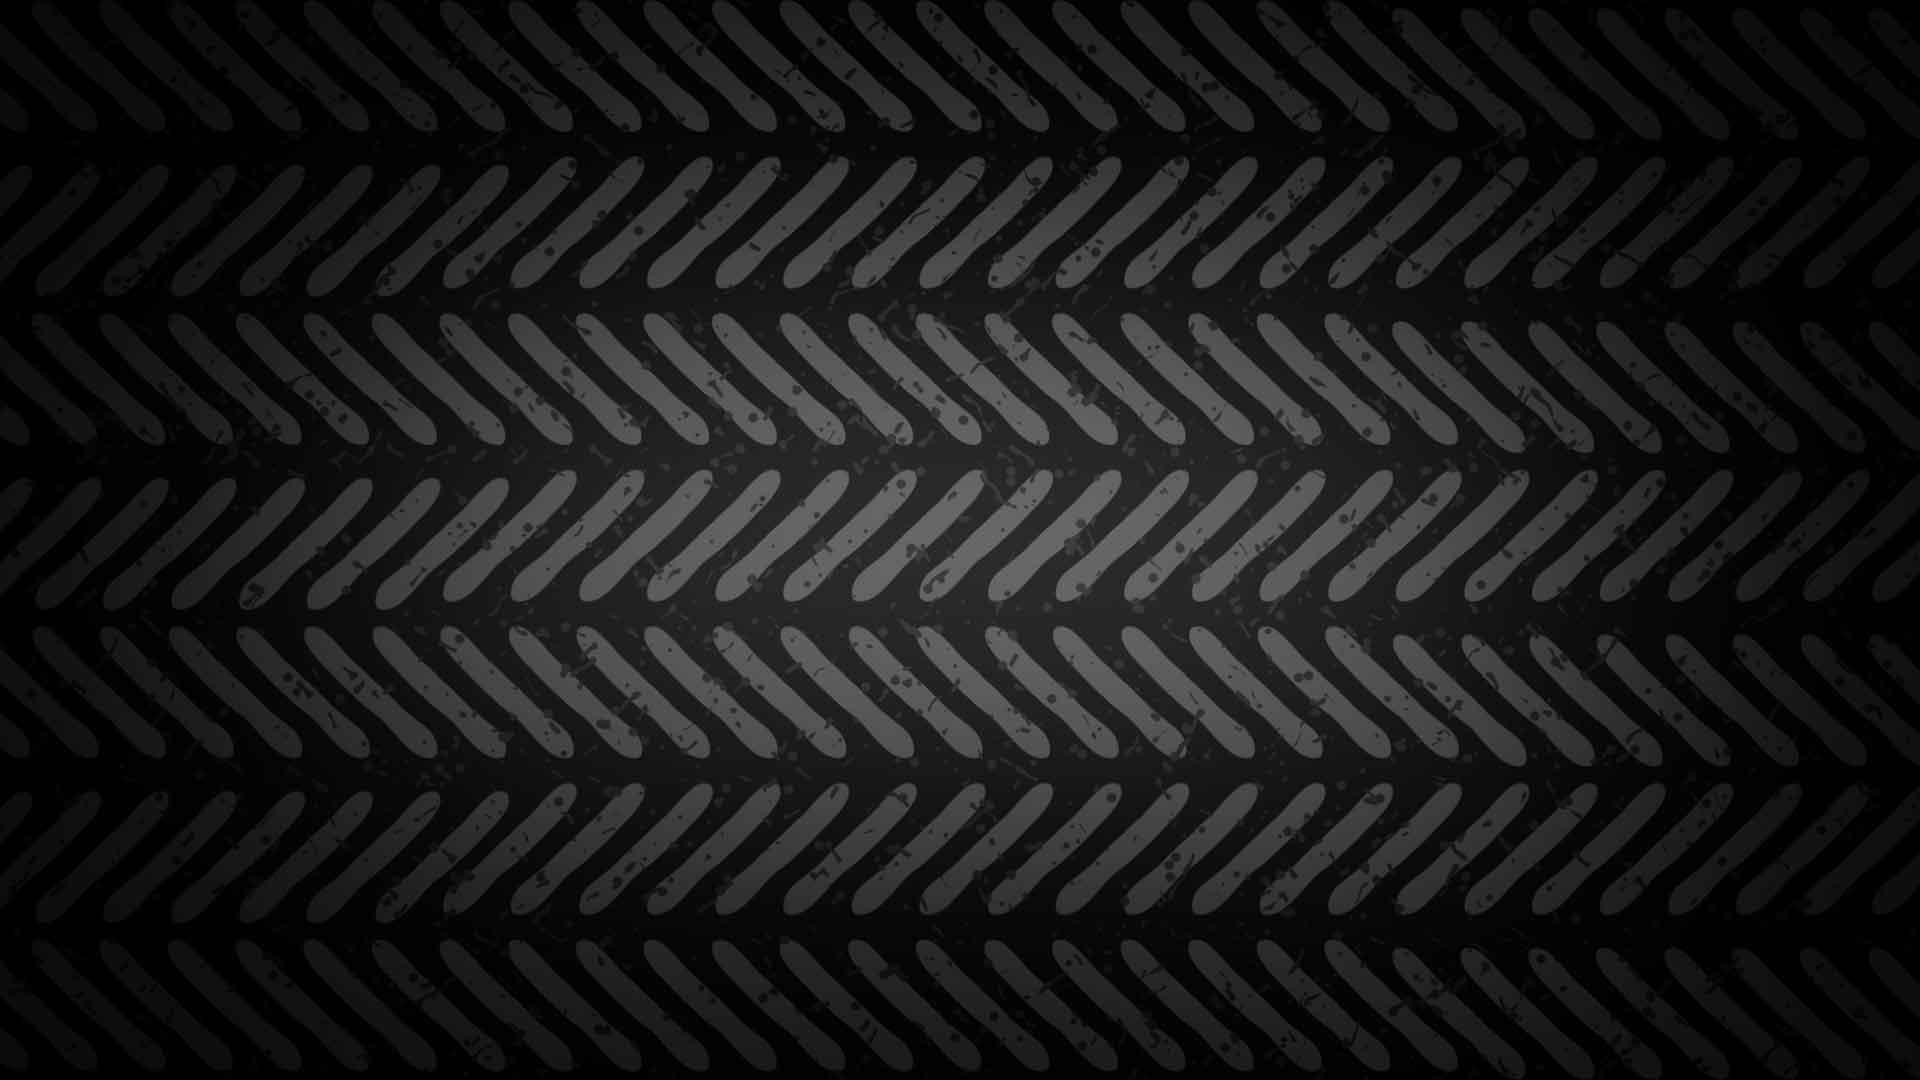 wallpaper black 1920x1080